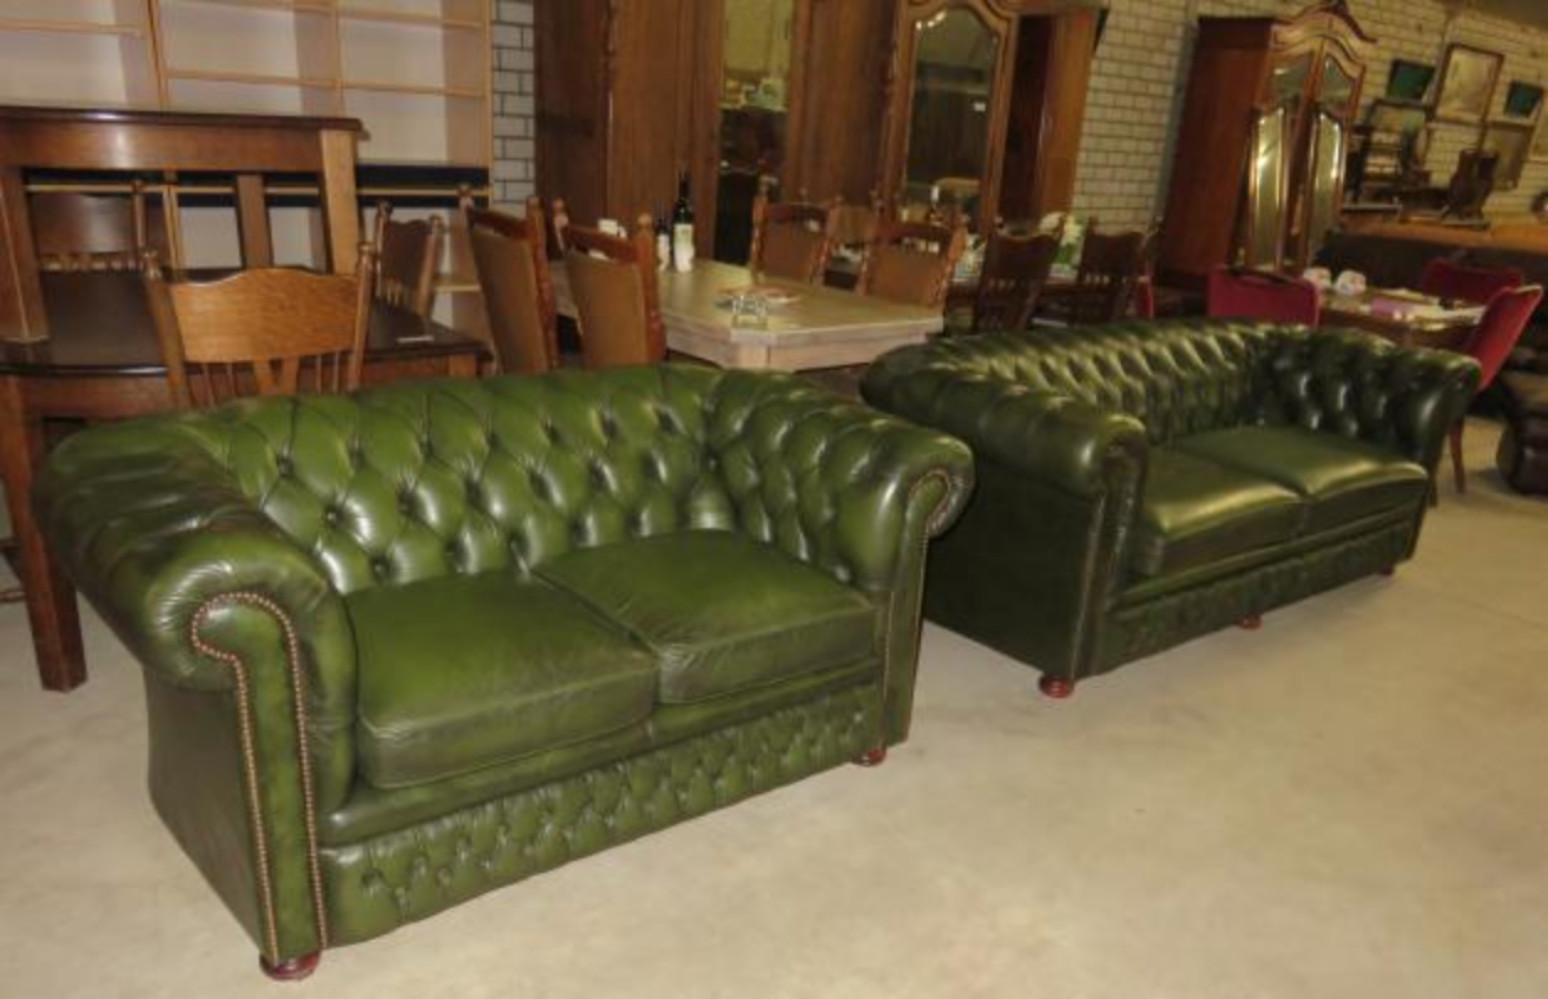 Brilliant Nice 3 2 Green Chesterfield Sofa Set Sofasets Chairs Inzonedesignstudio Interior Chair Design Inzonedesignstudiocom